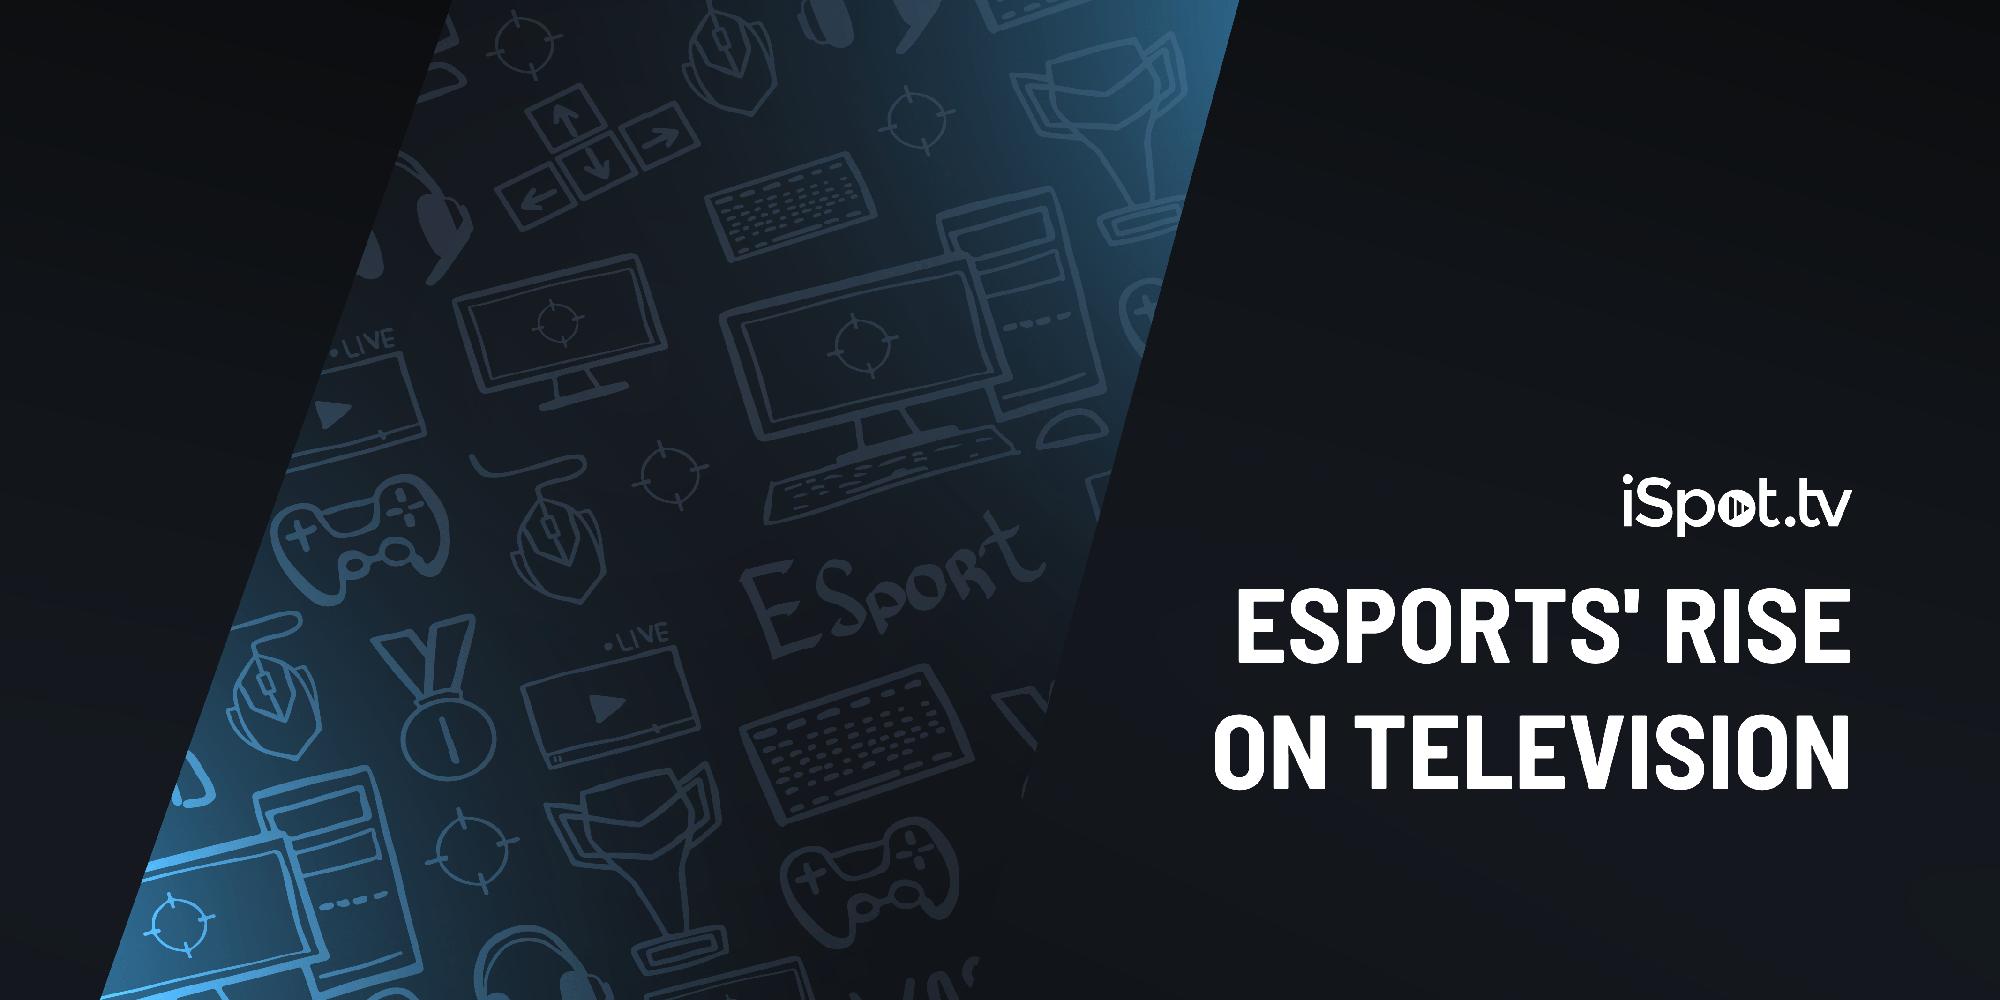 Esports' Rise on Television